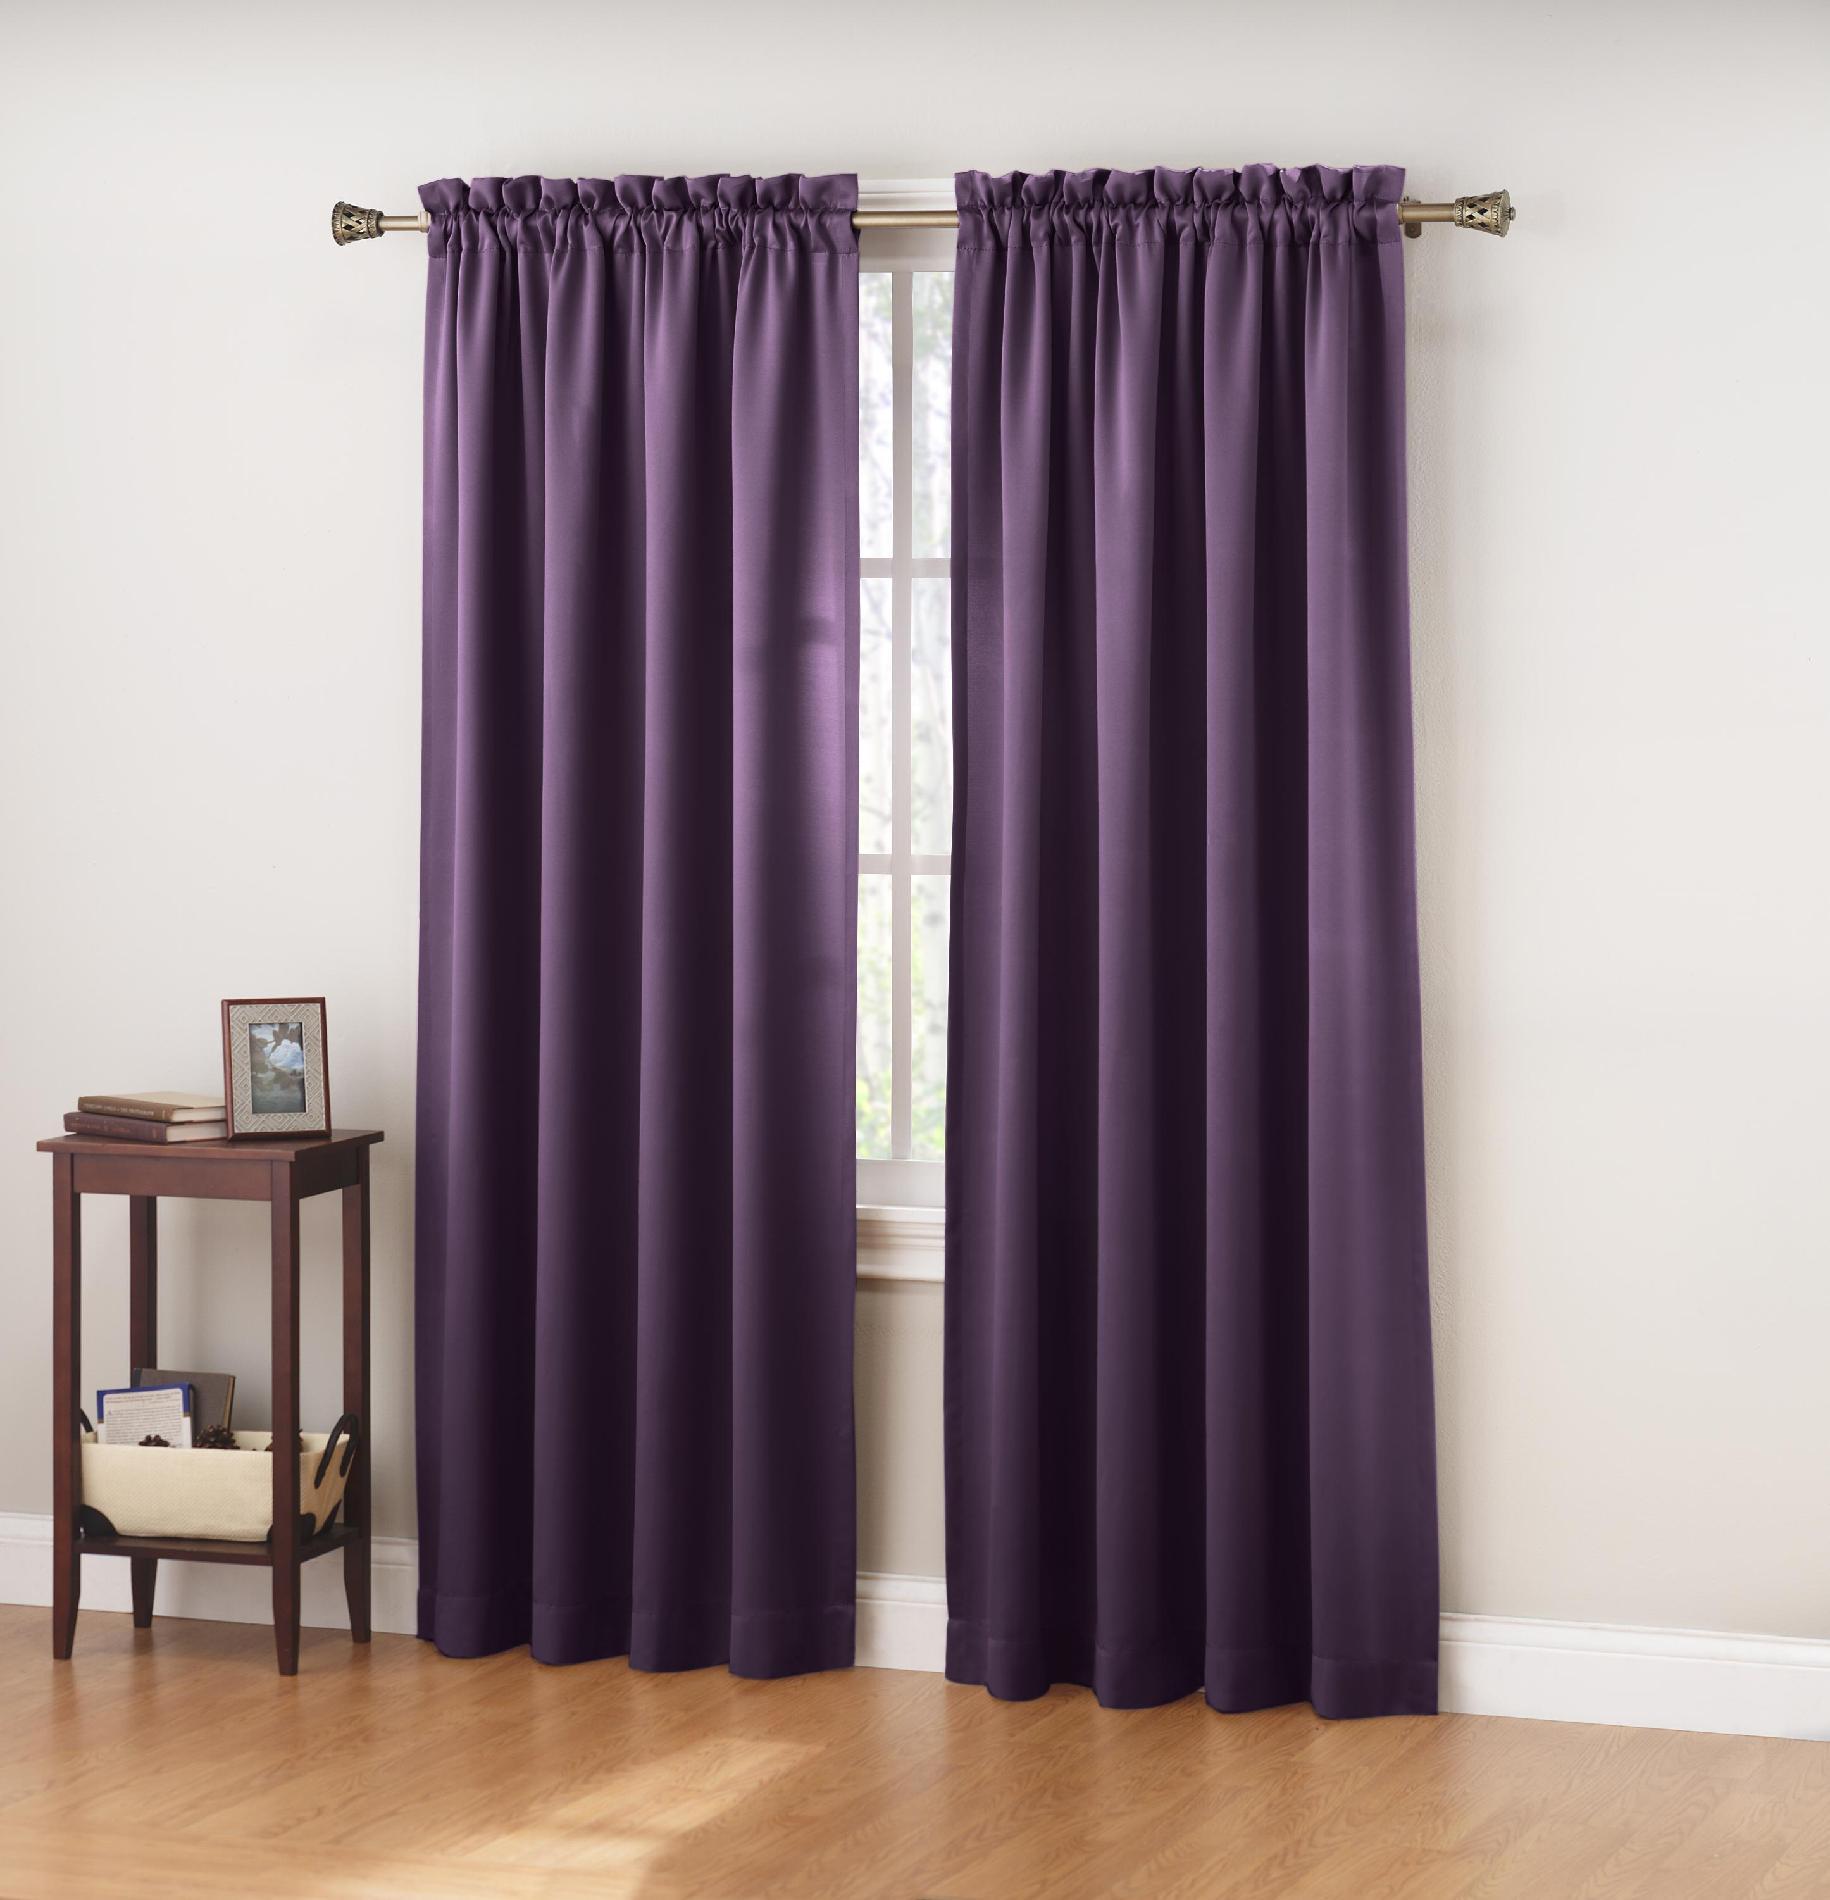 Amazing Colormate Jillian Room Darkening Window Curtain Panel window curtain panels